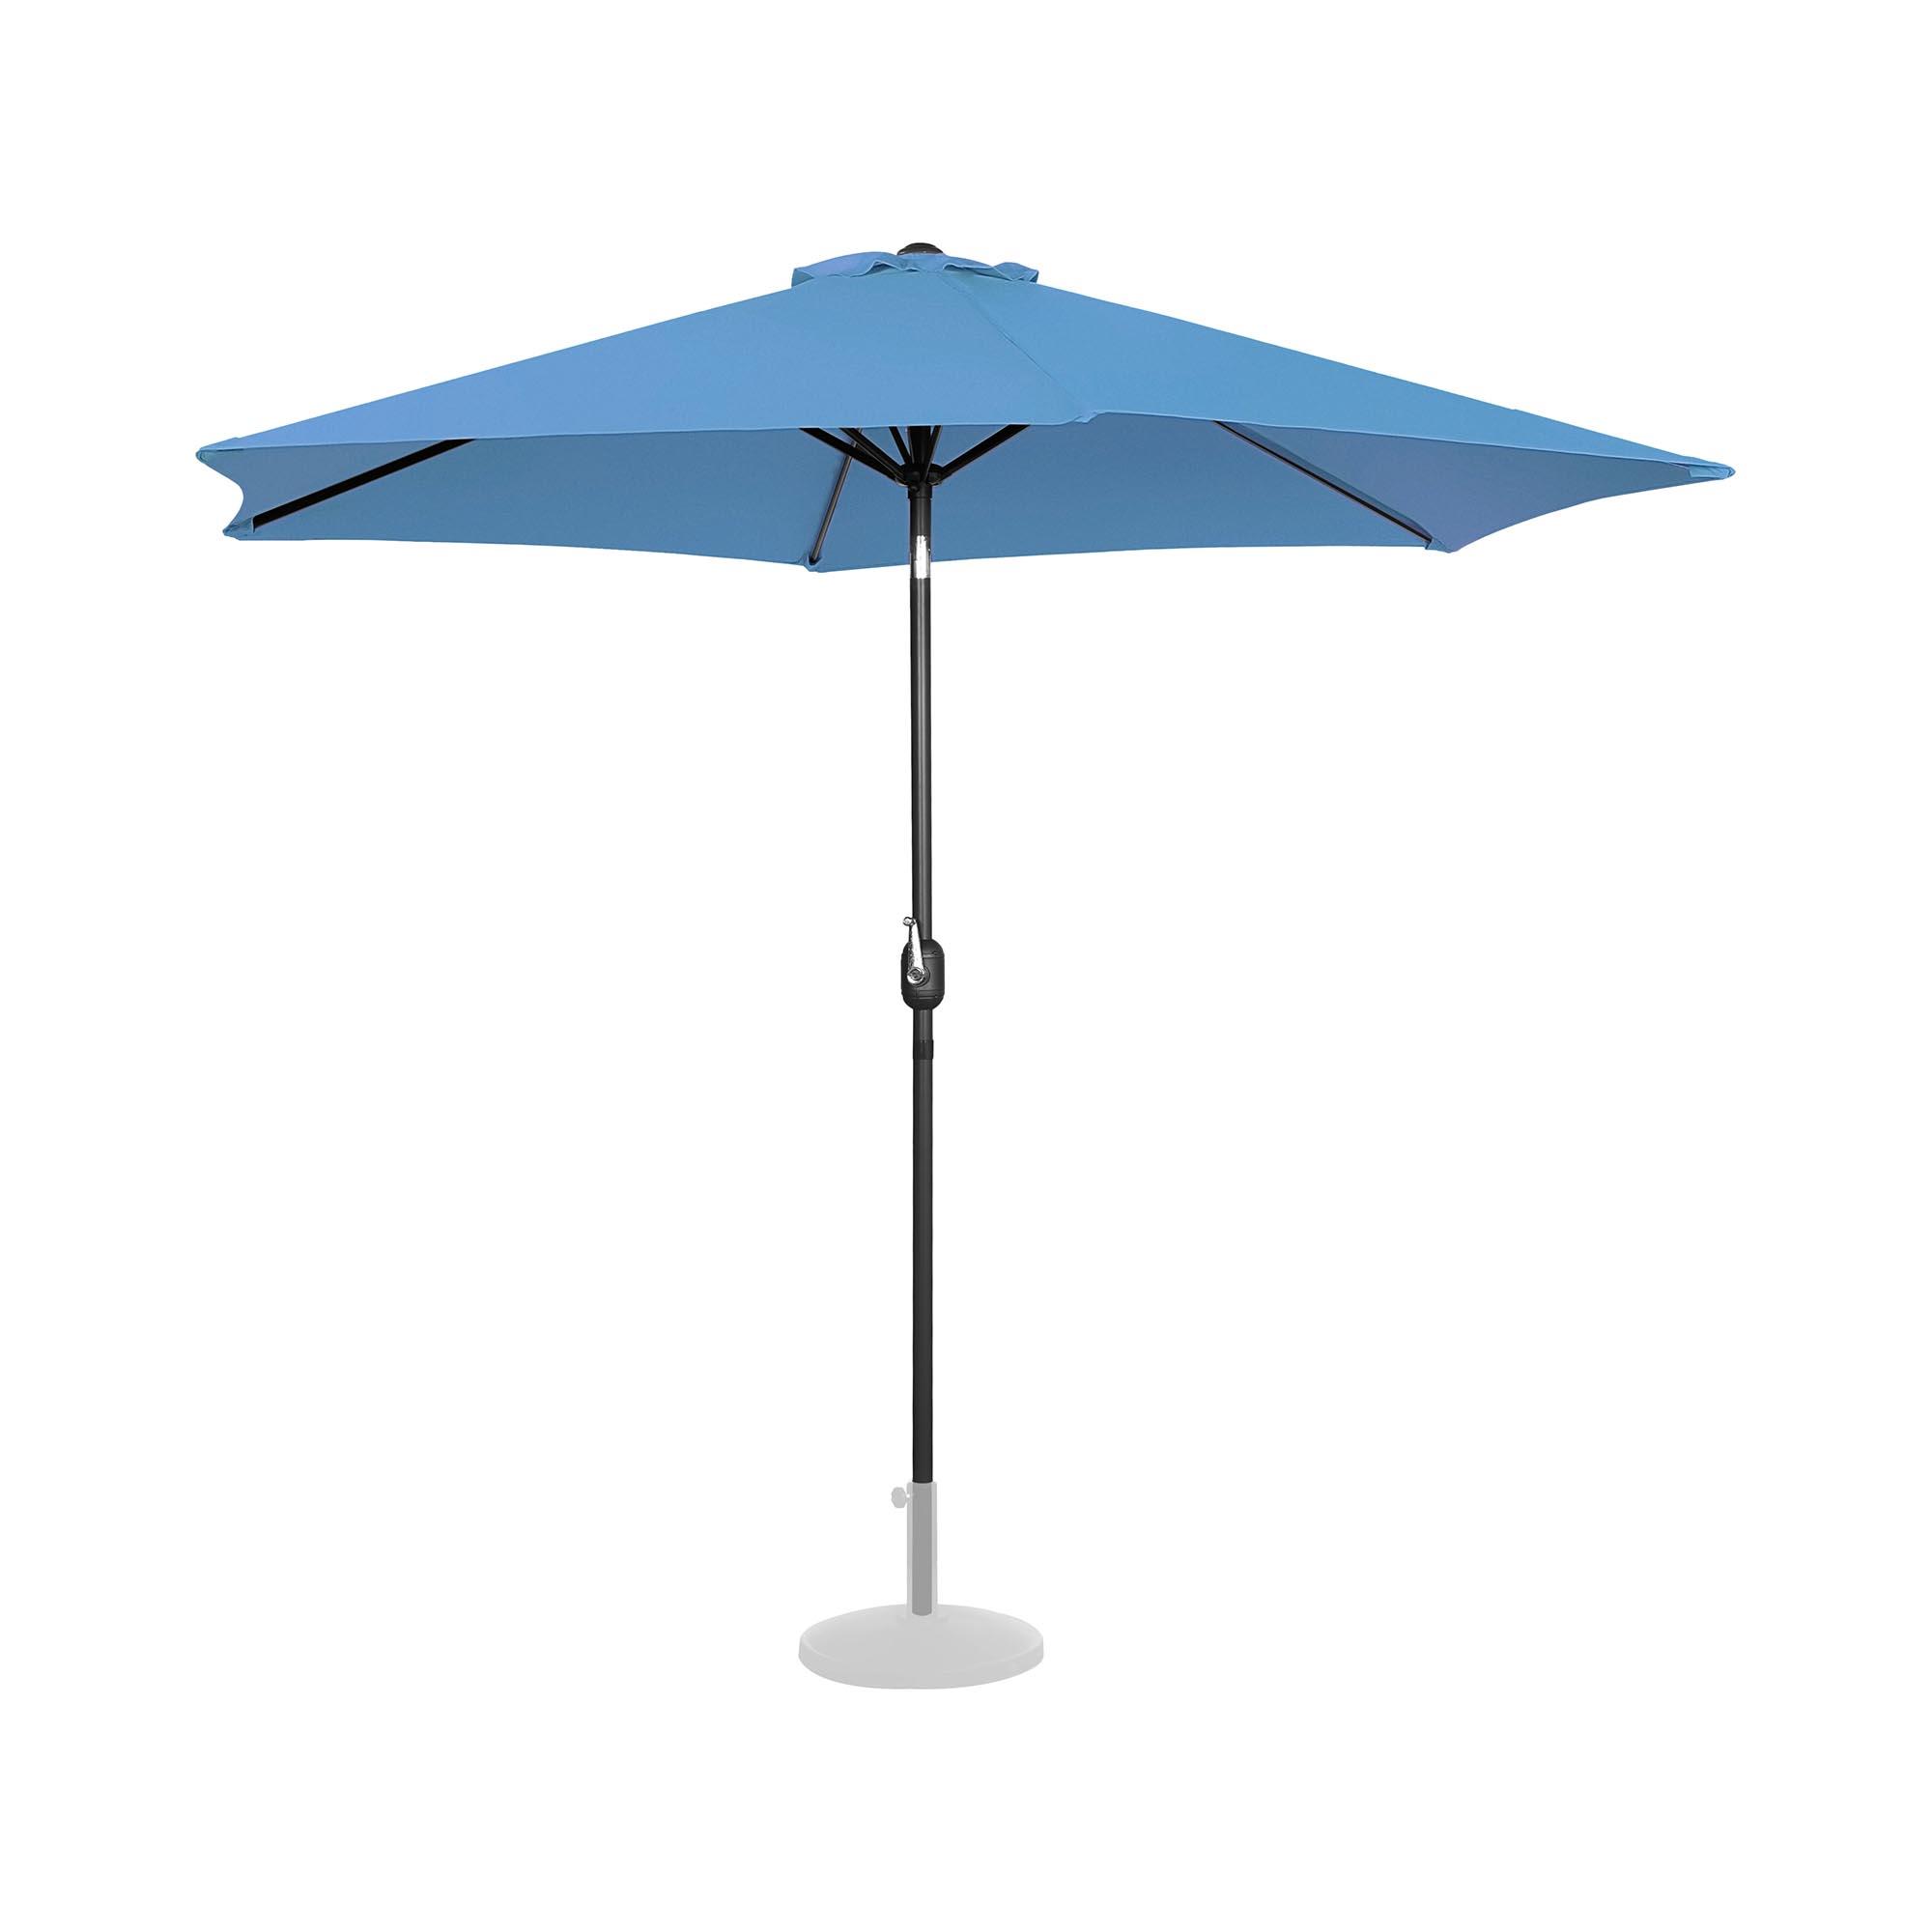 Uniprodo Sonnenschirm groß - blau - sechseckig - Ø 300 cm - neigbar UNI_UMBRELLA_TR300BL